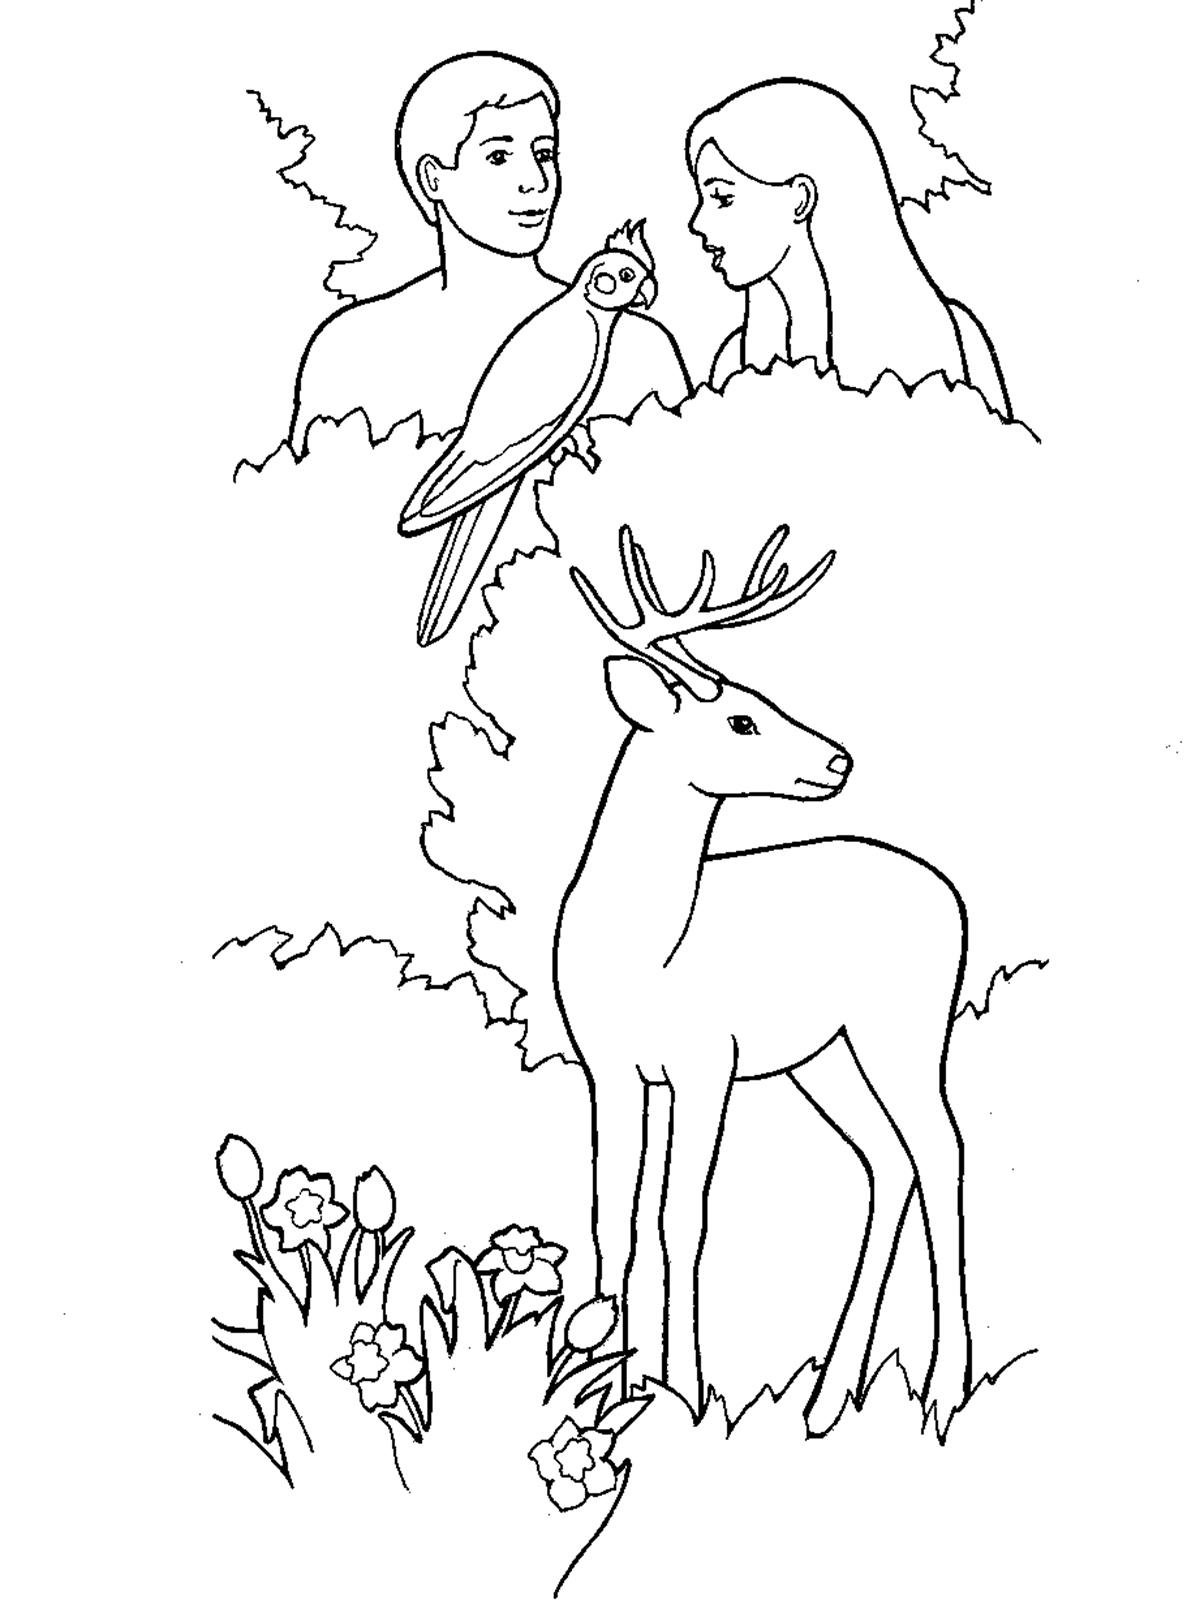 Creation Adam And Eve In The Garden Of Eden